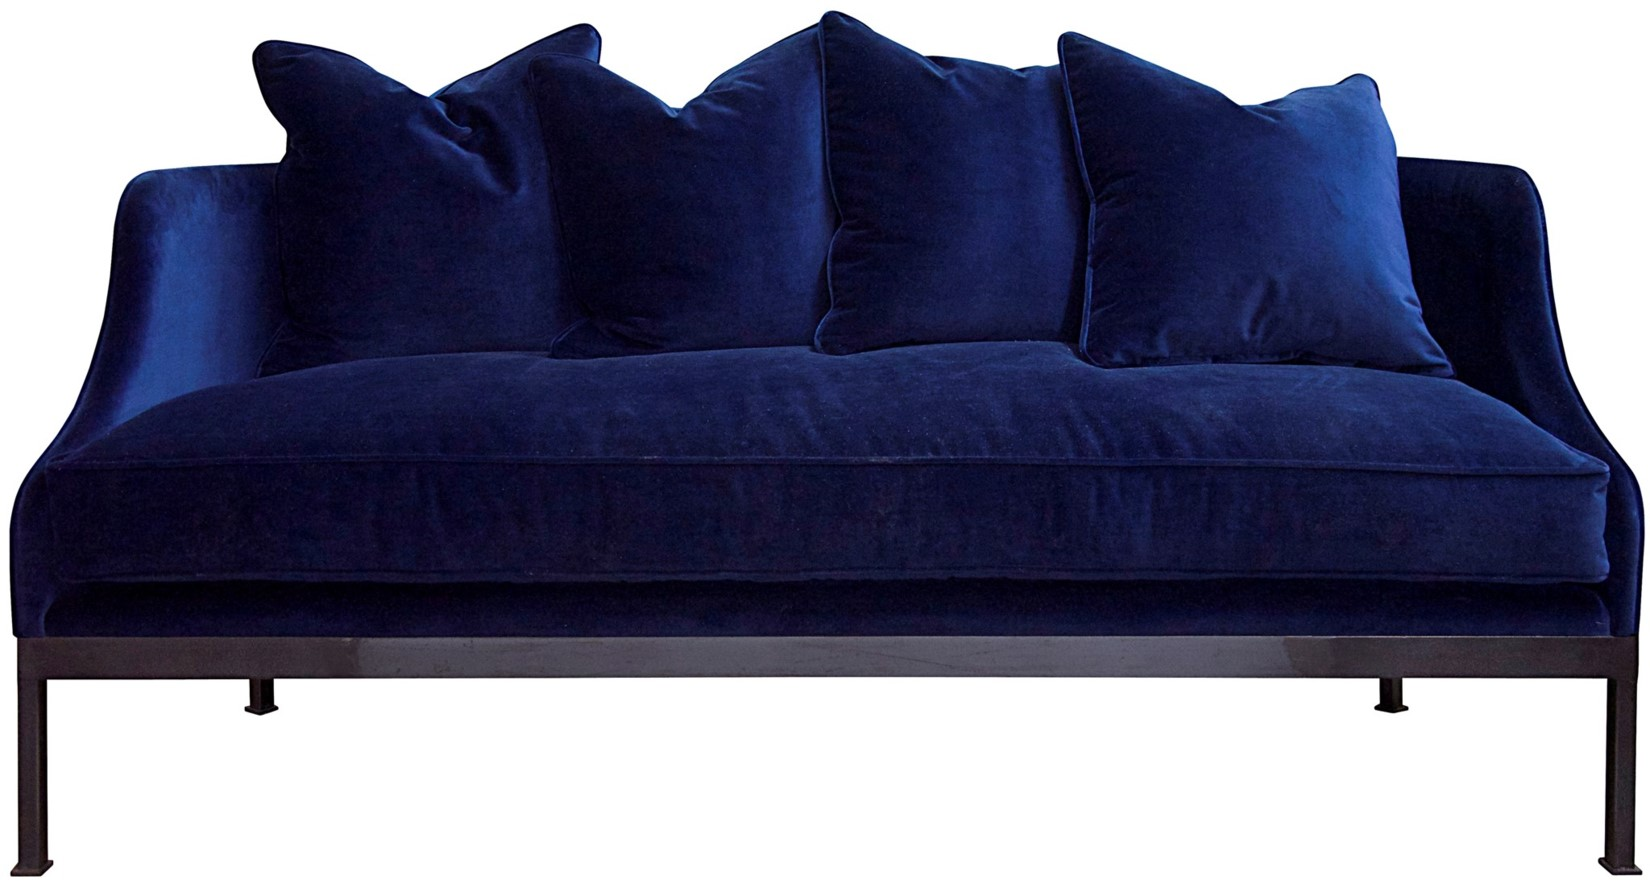 Astonishing Cfc Andrewgaddart Wooden Chair Designs For Living Room Andrewgaddartcom